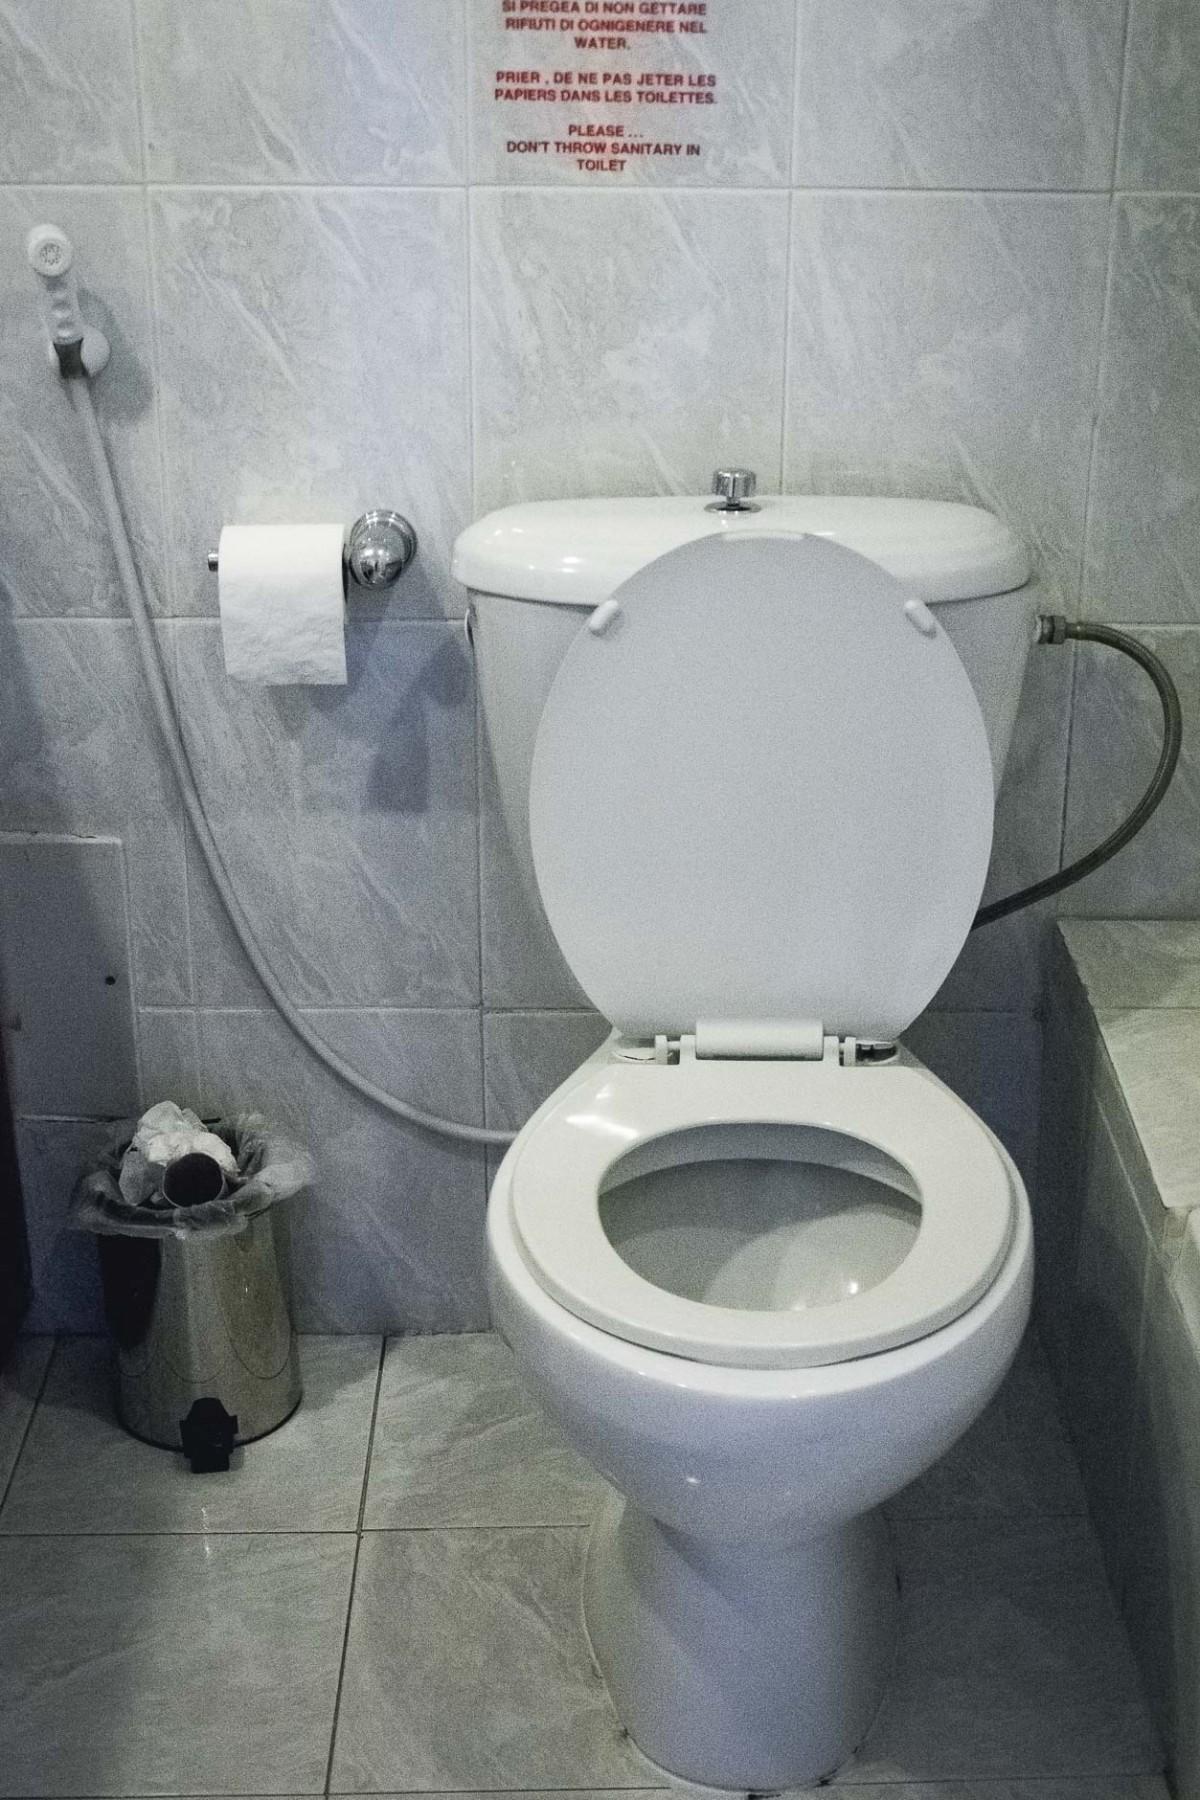 Toilet in Jordan